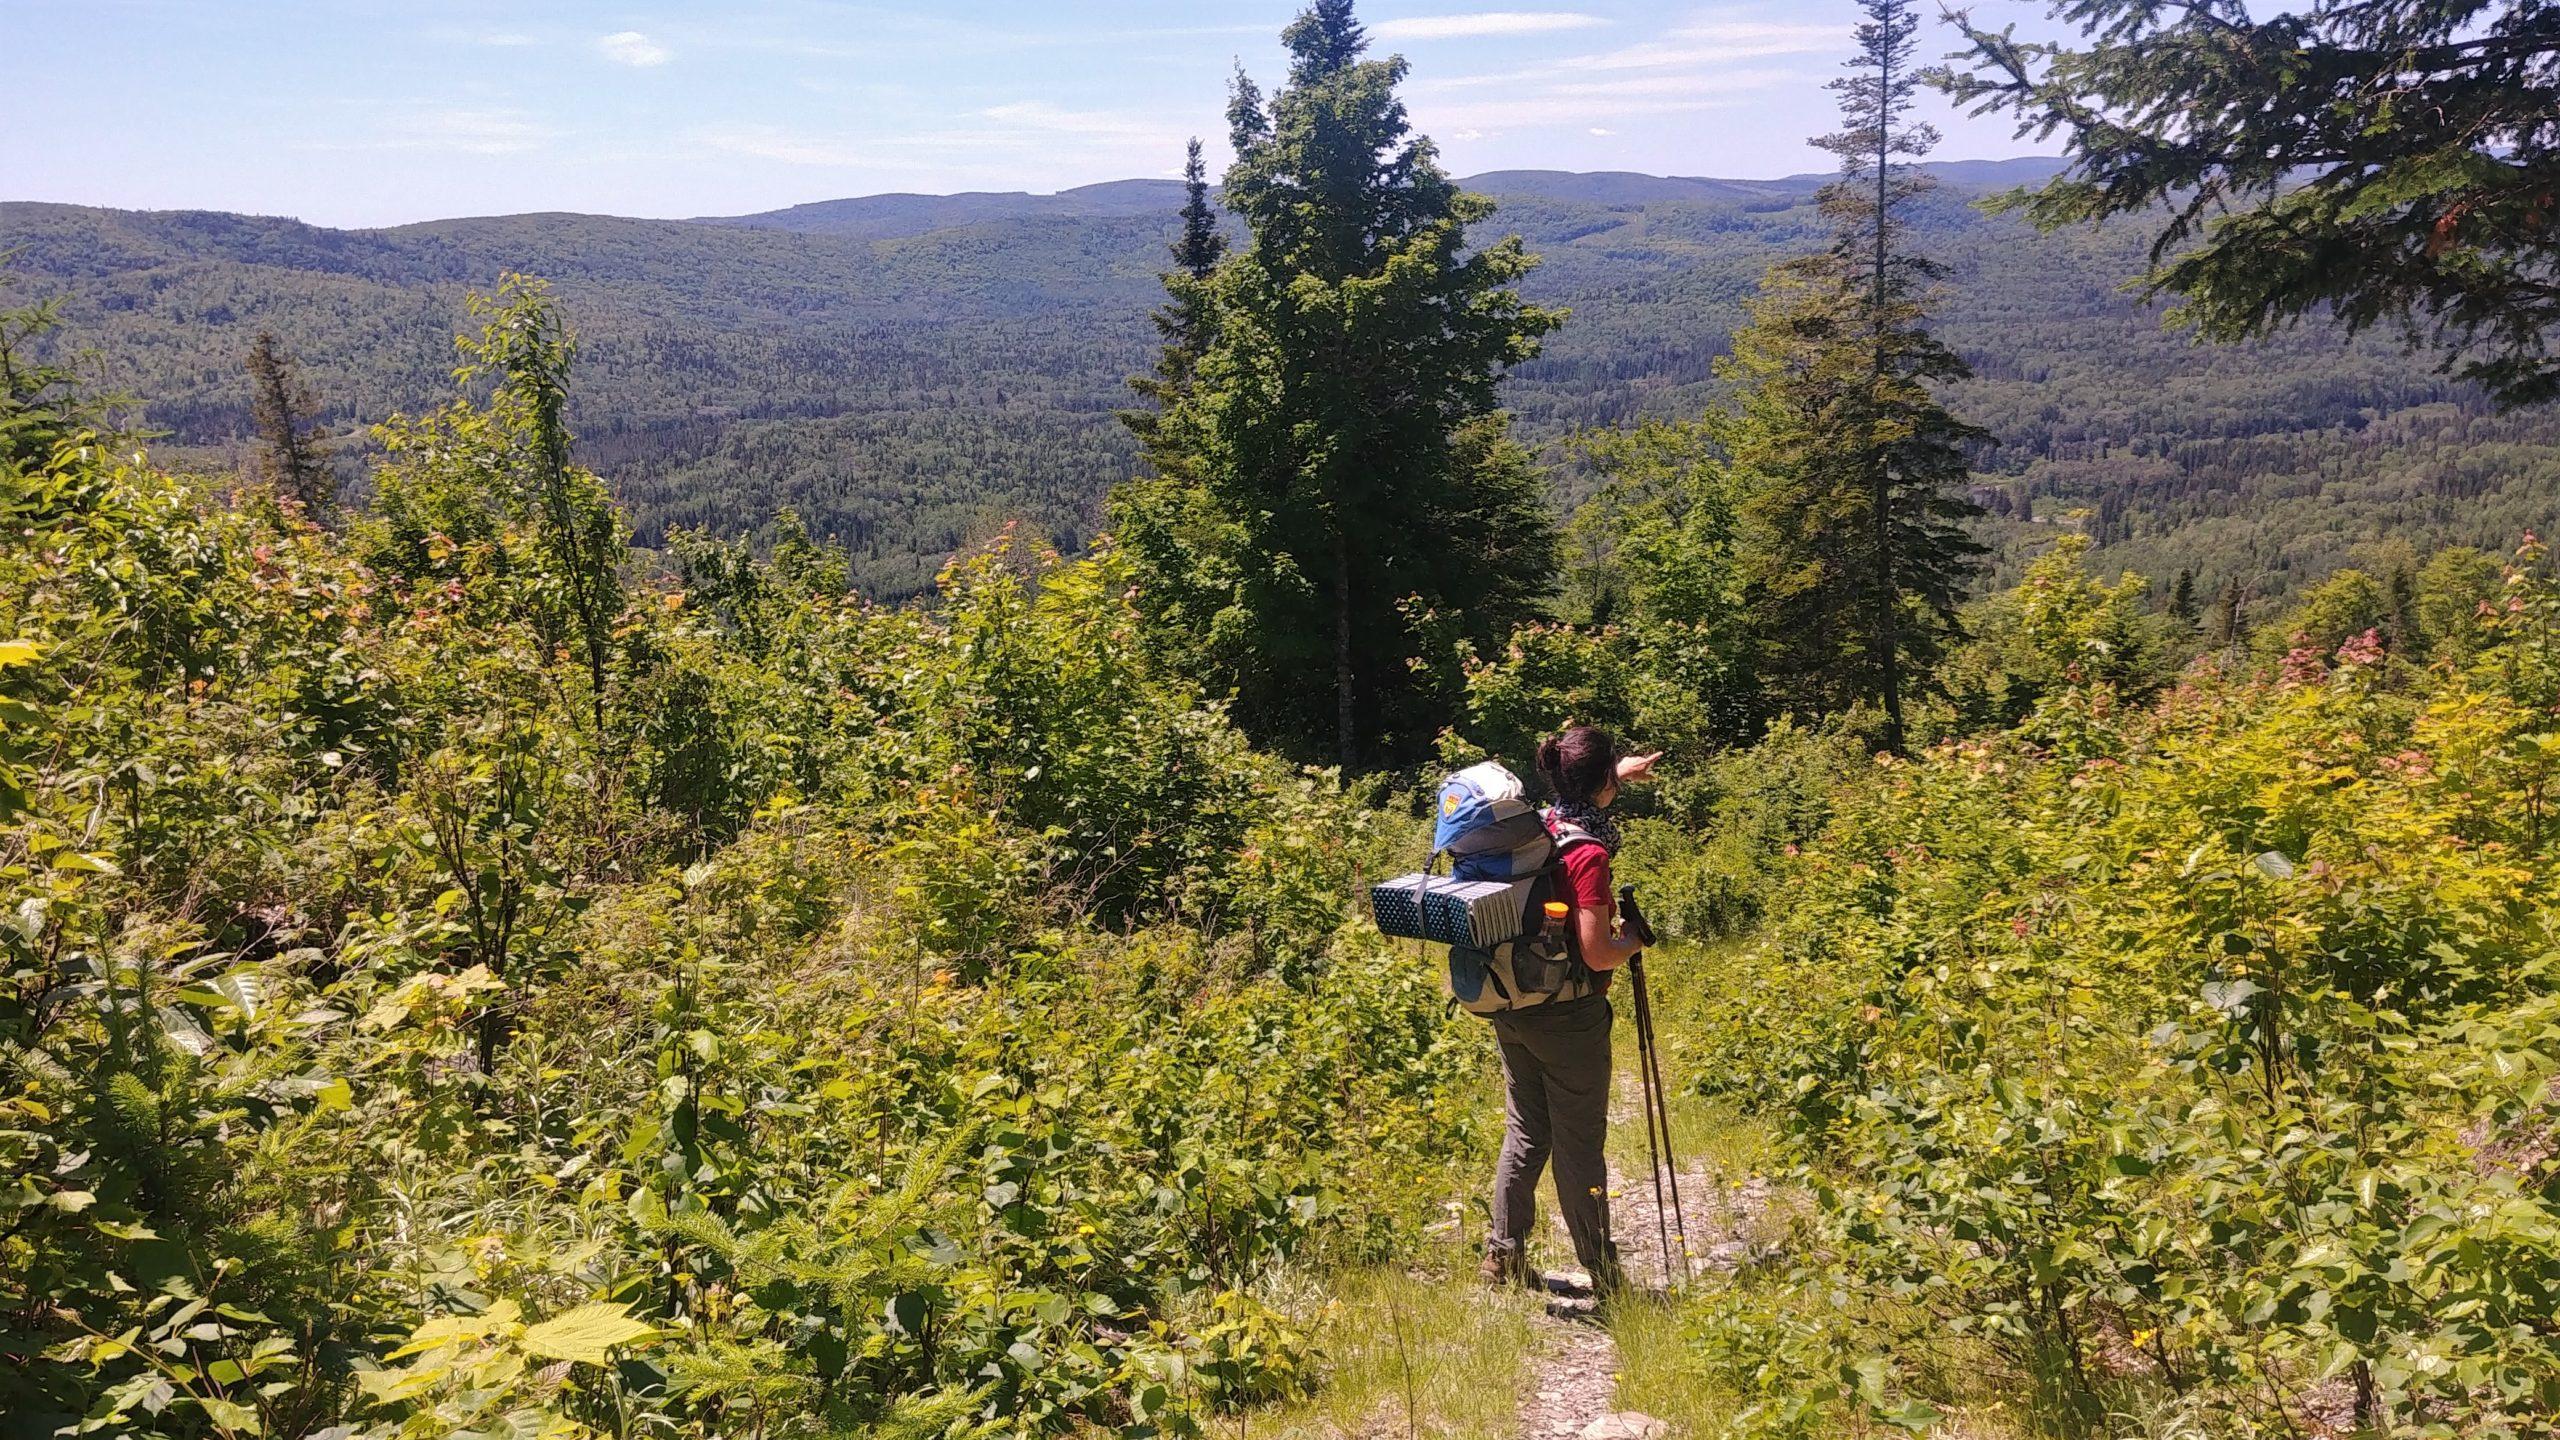 Sentier Meruimticook Edmundston où randonner blog voyage Arpenter le chemin